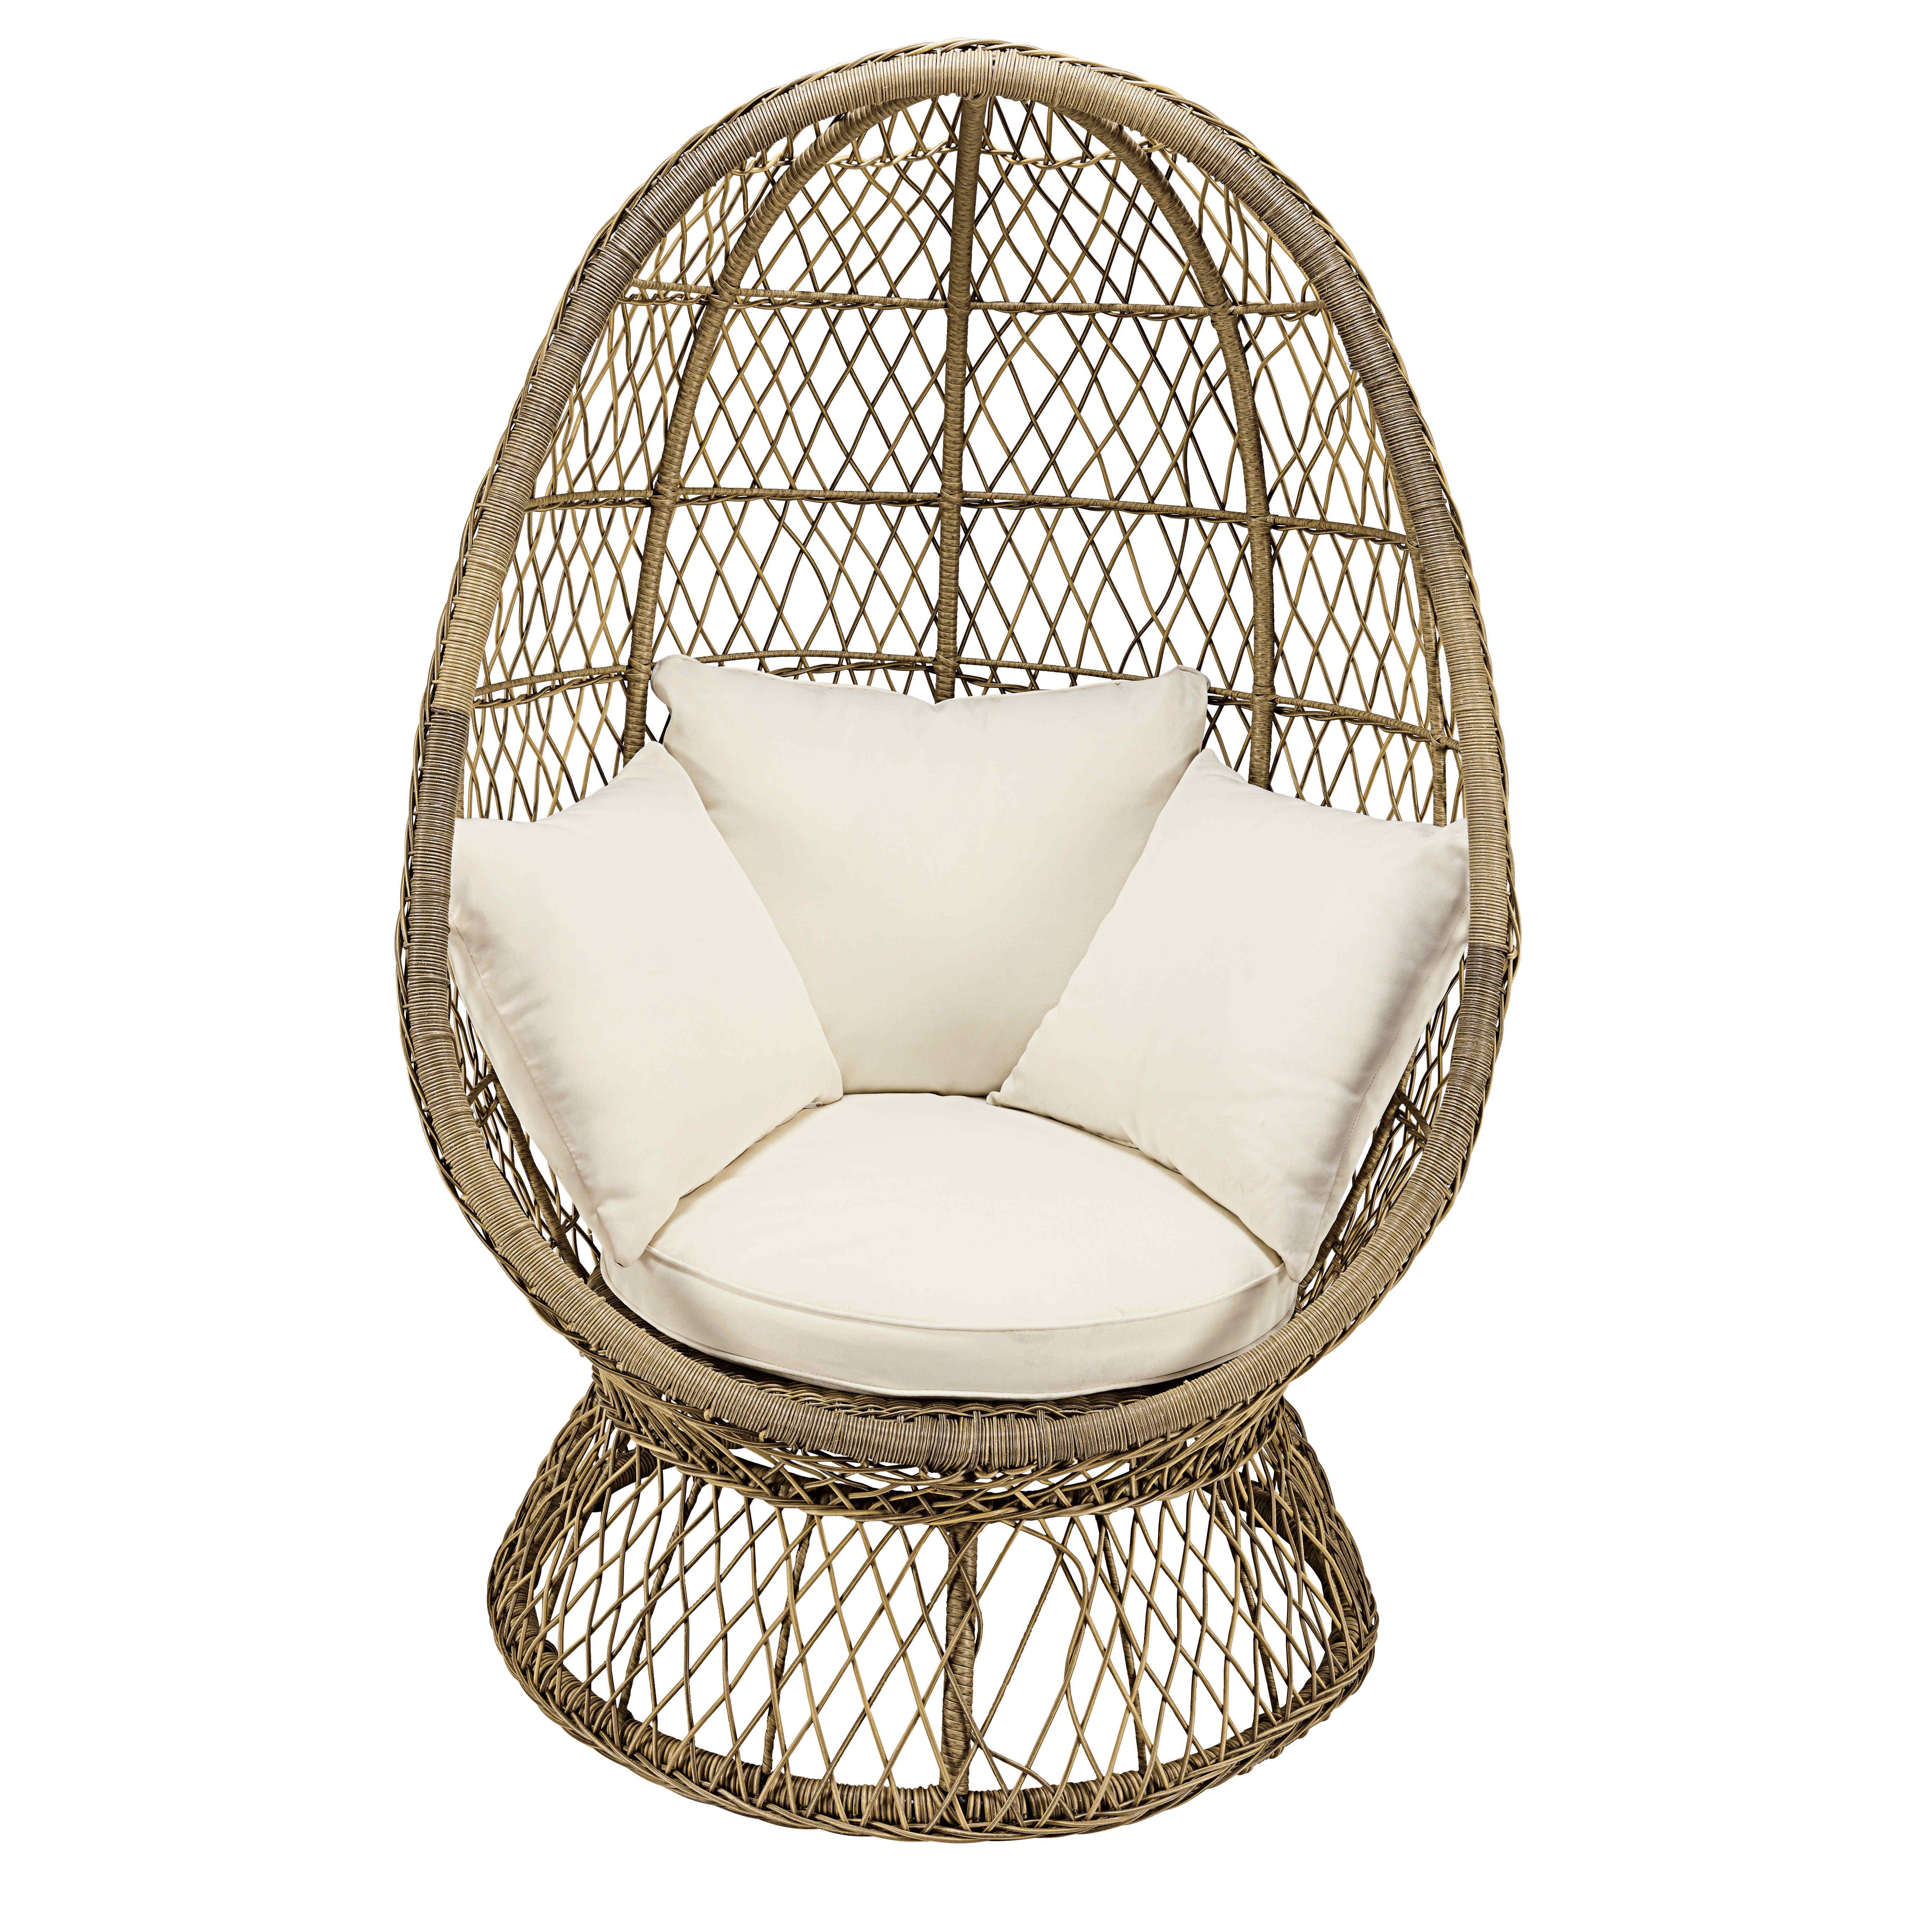 Tuinstoel Hangend Ei.Loungen Tropenwonen Chair Egg Chair En Cushions